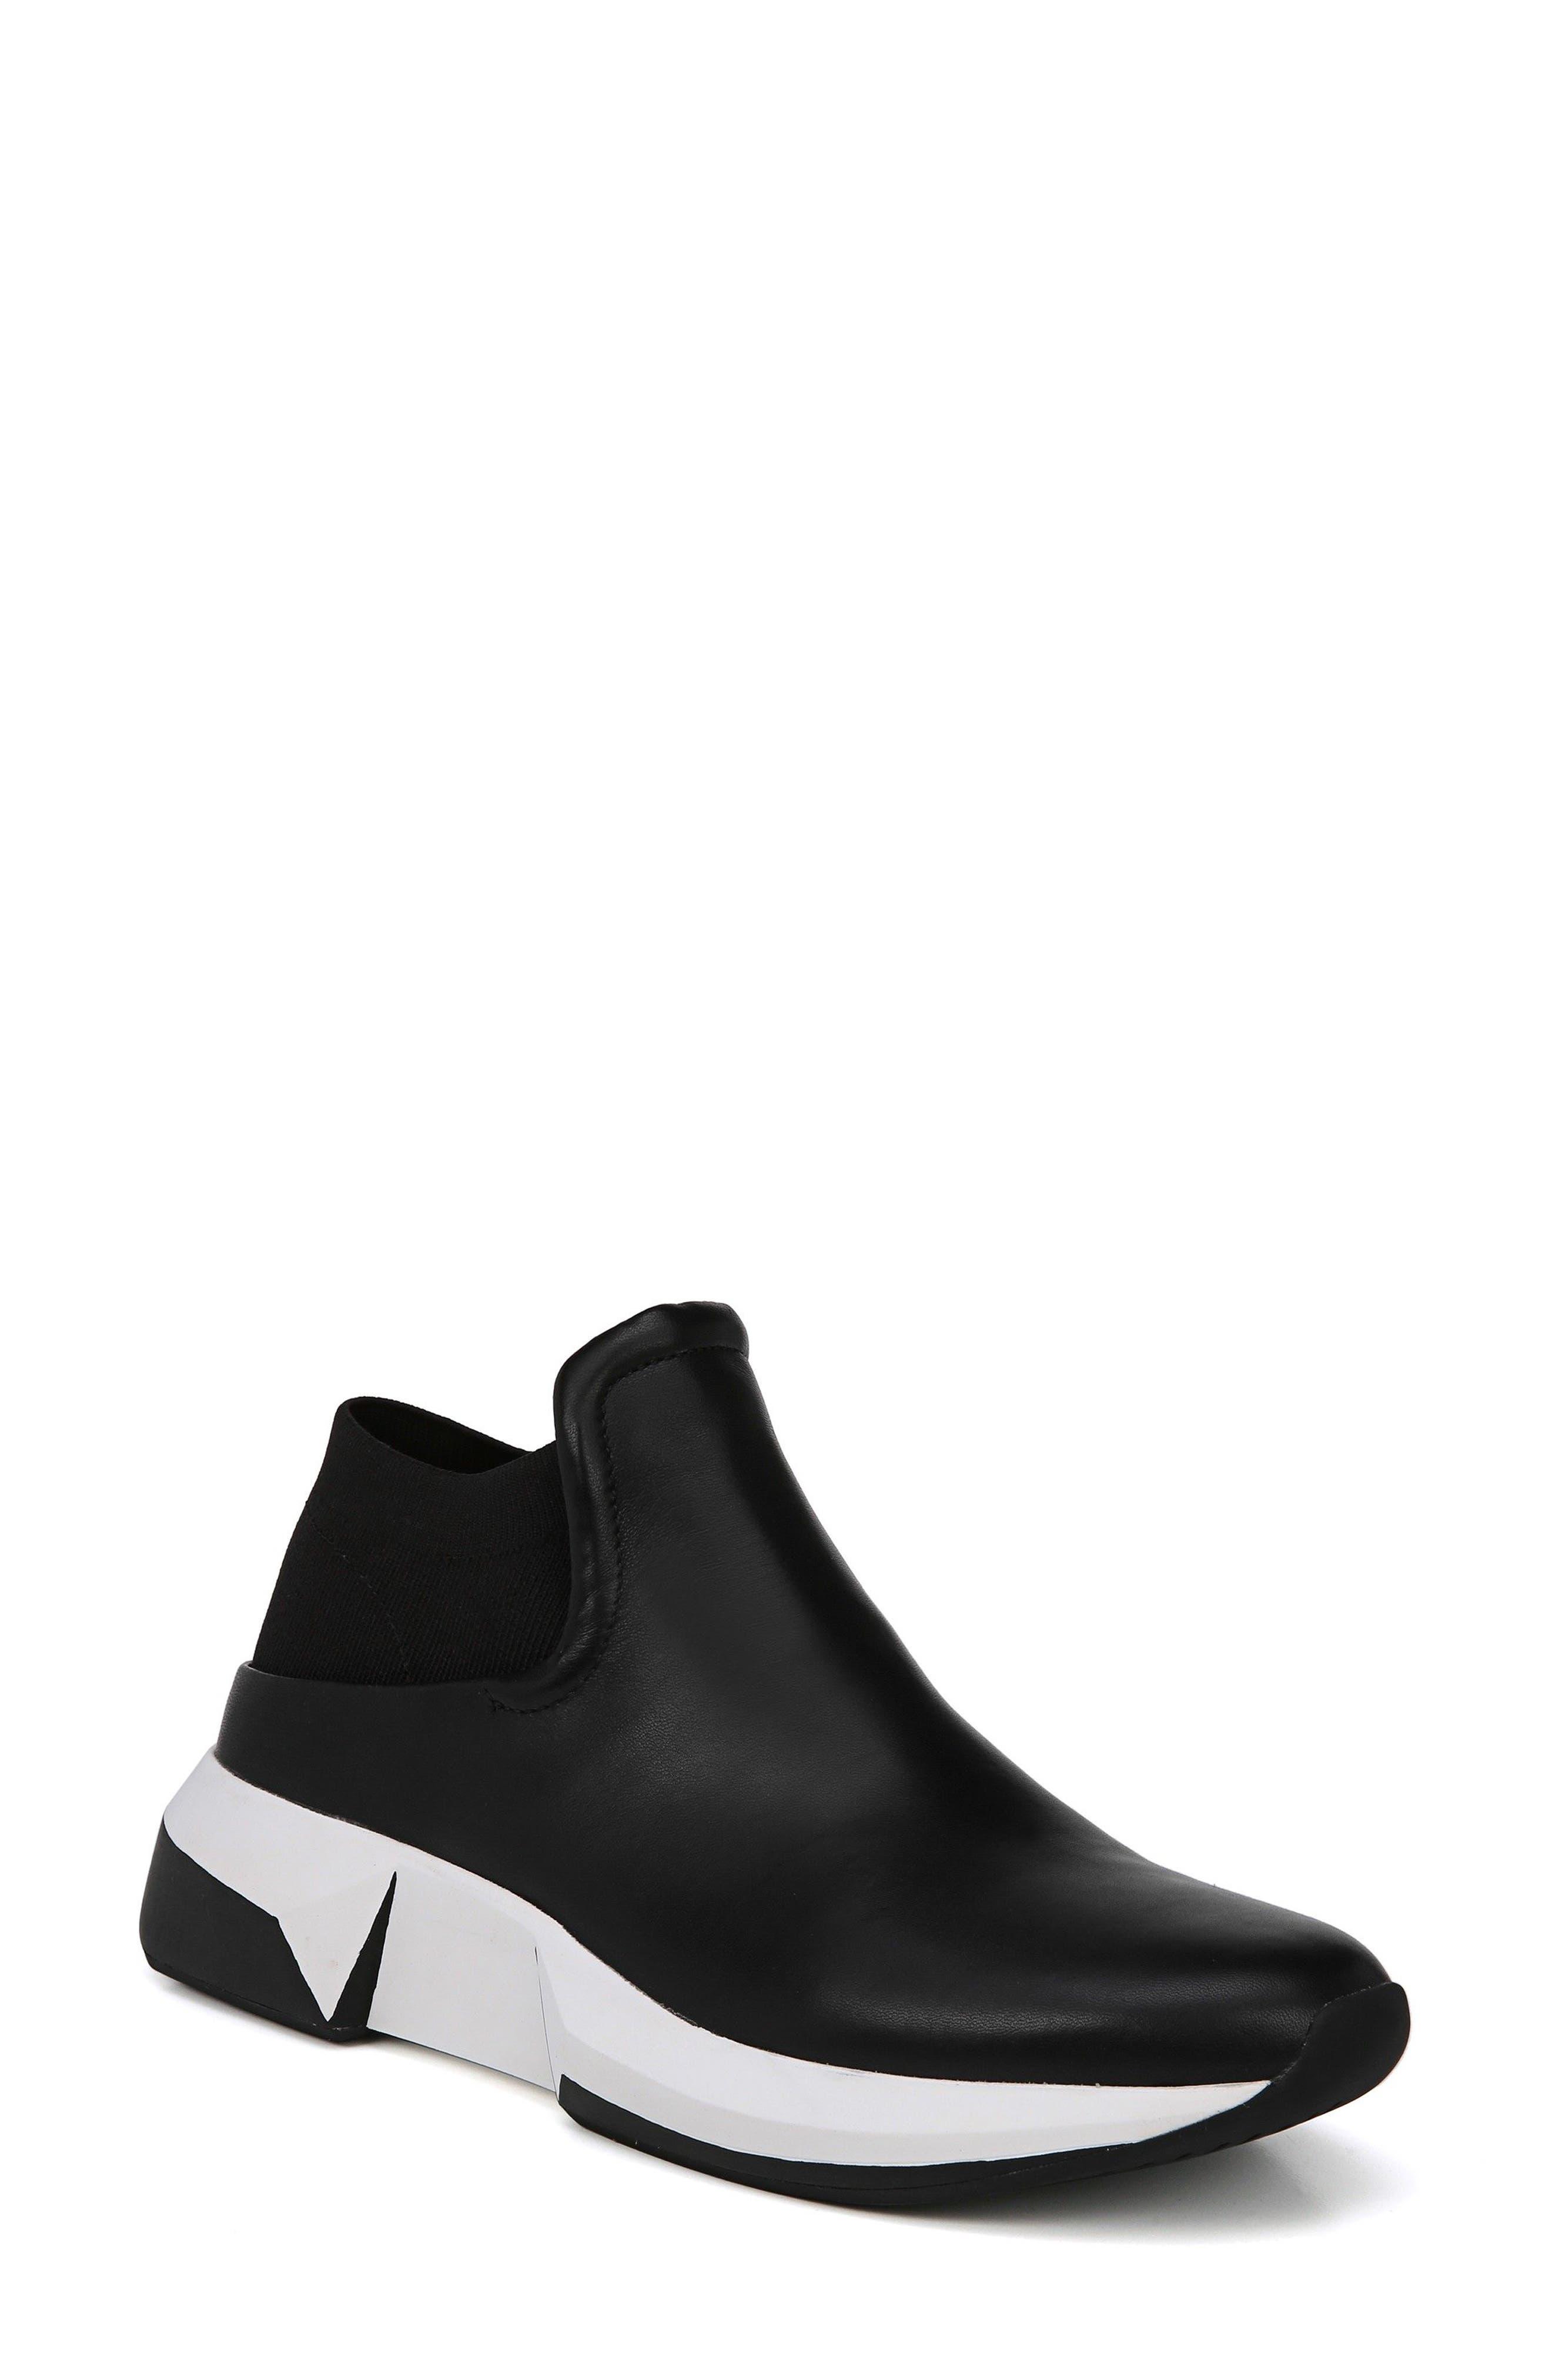 Veila Slip-On Sneaker,                             Main thumbnail 1, color,                             Black Leather